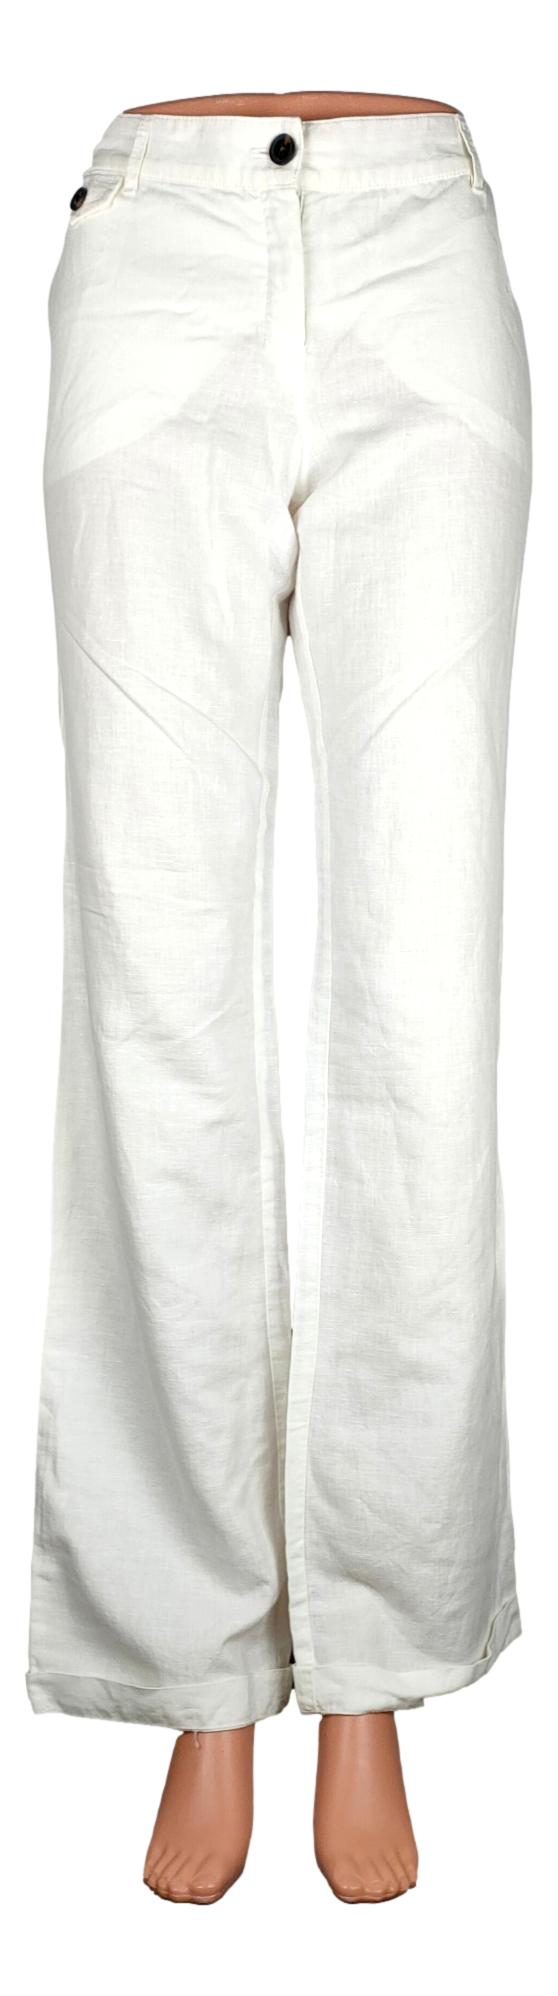 Pantalon Mango - Taille 40